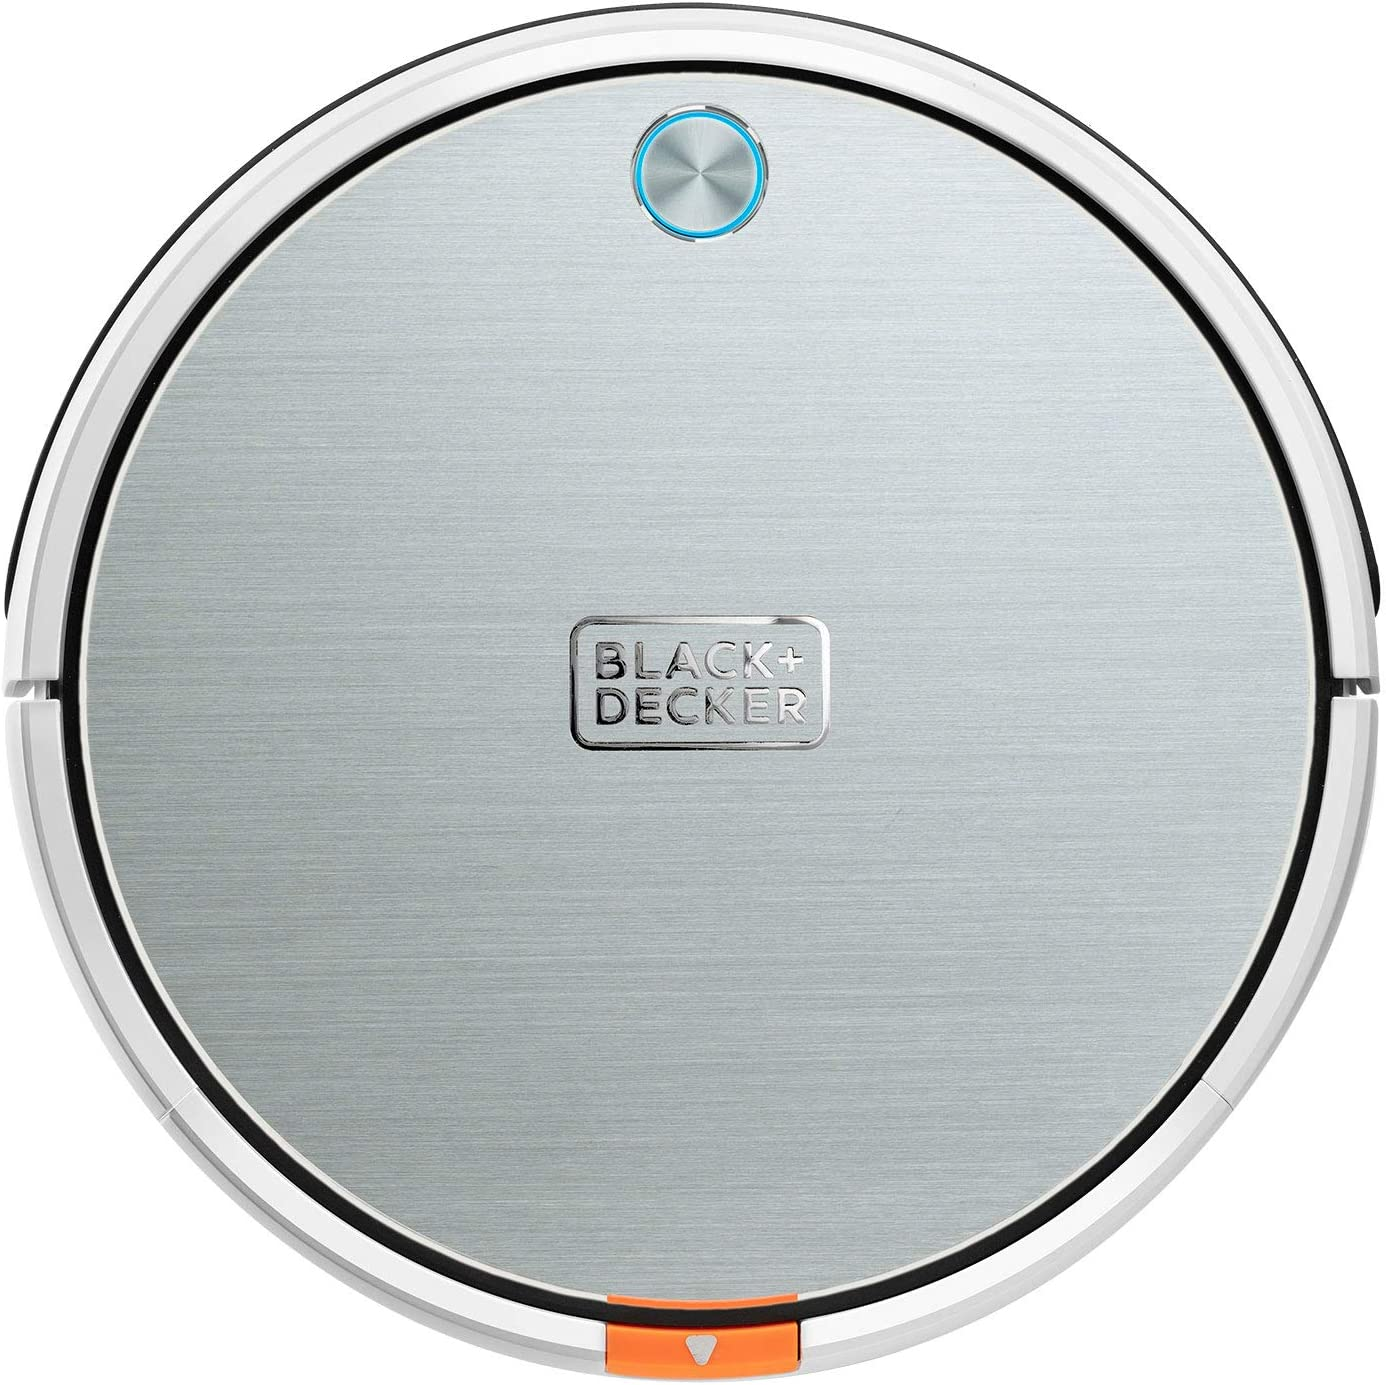 Barre Aspira Sistema de filtrado Doble Navegaci/ón Inteligente Pasa la mopa y friega Robot Aspirador 4 en 1 Black+Decker BXRV500E Mando a Distancia. Programable 4 Modos de Limpieza